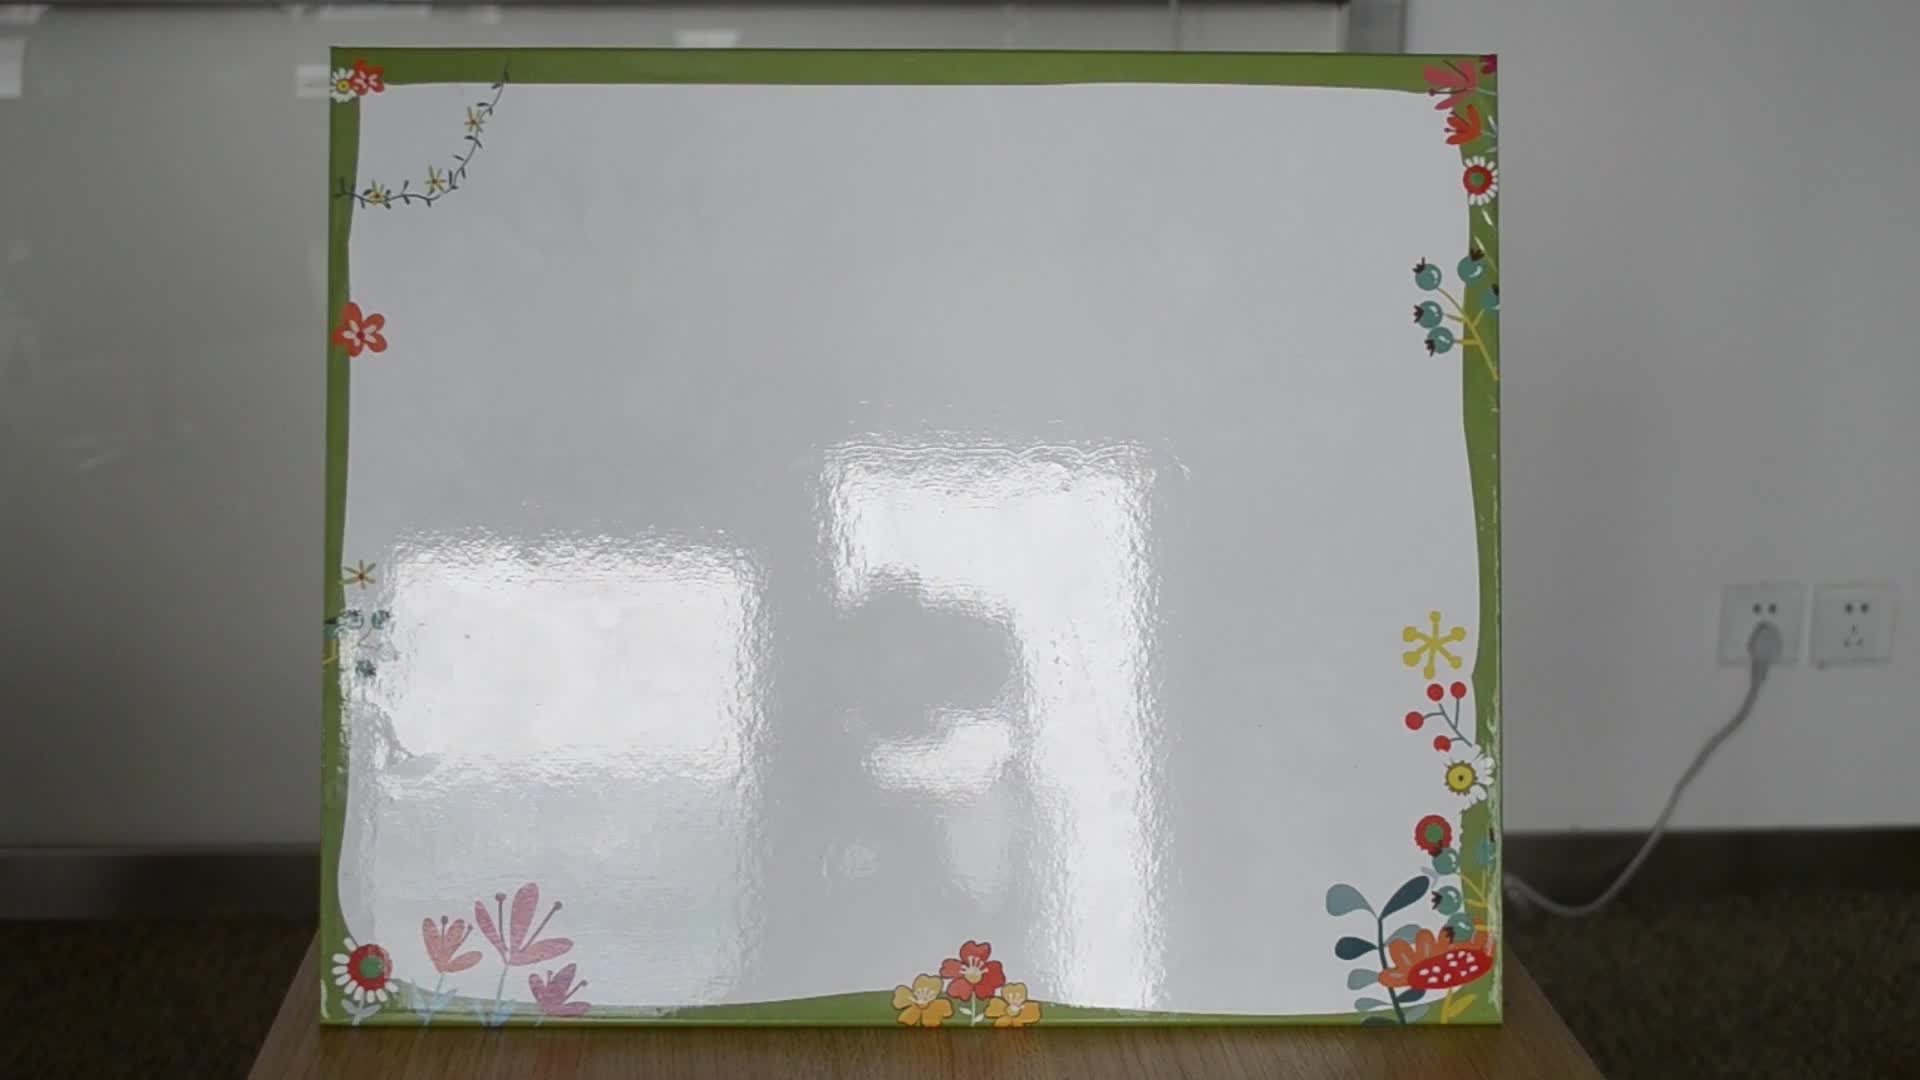 TW1.4-1 Foldable व्हाइटबोर्ड शैक्षिक खिलौने चुंबकीय सीखने संसाधनों शैक्षिक खिलौने बच्चों के लिए